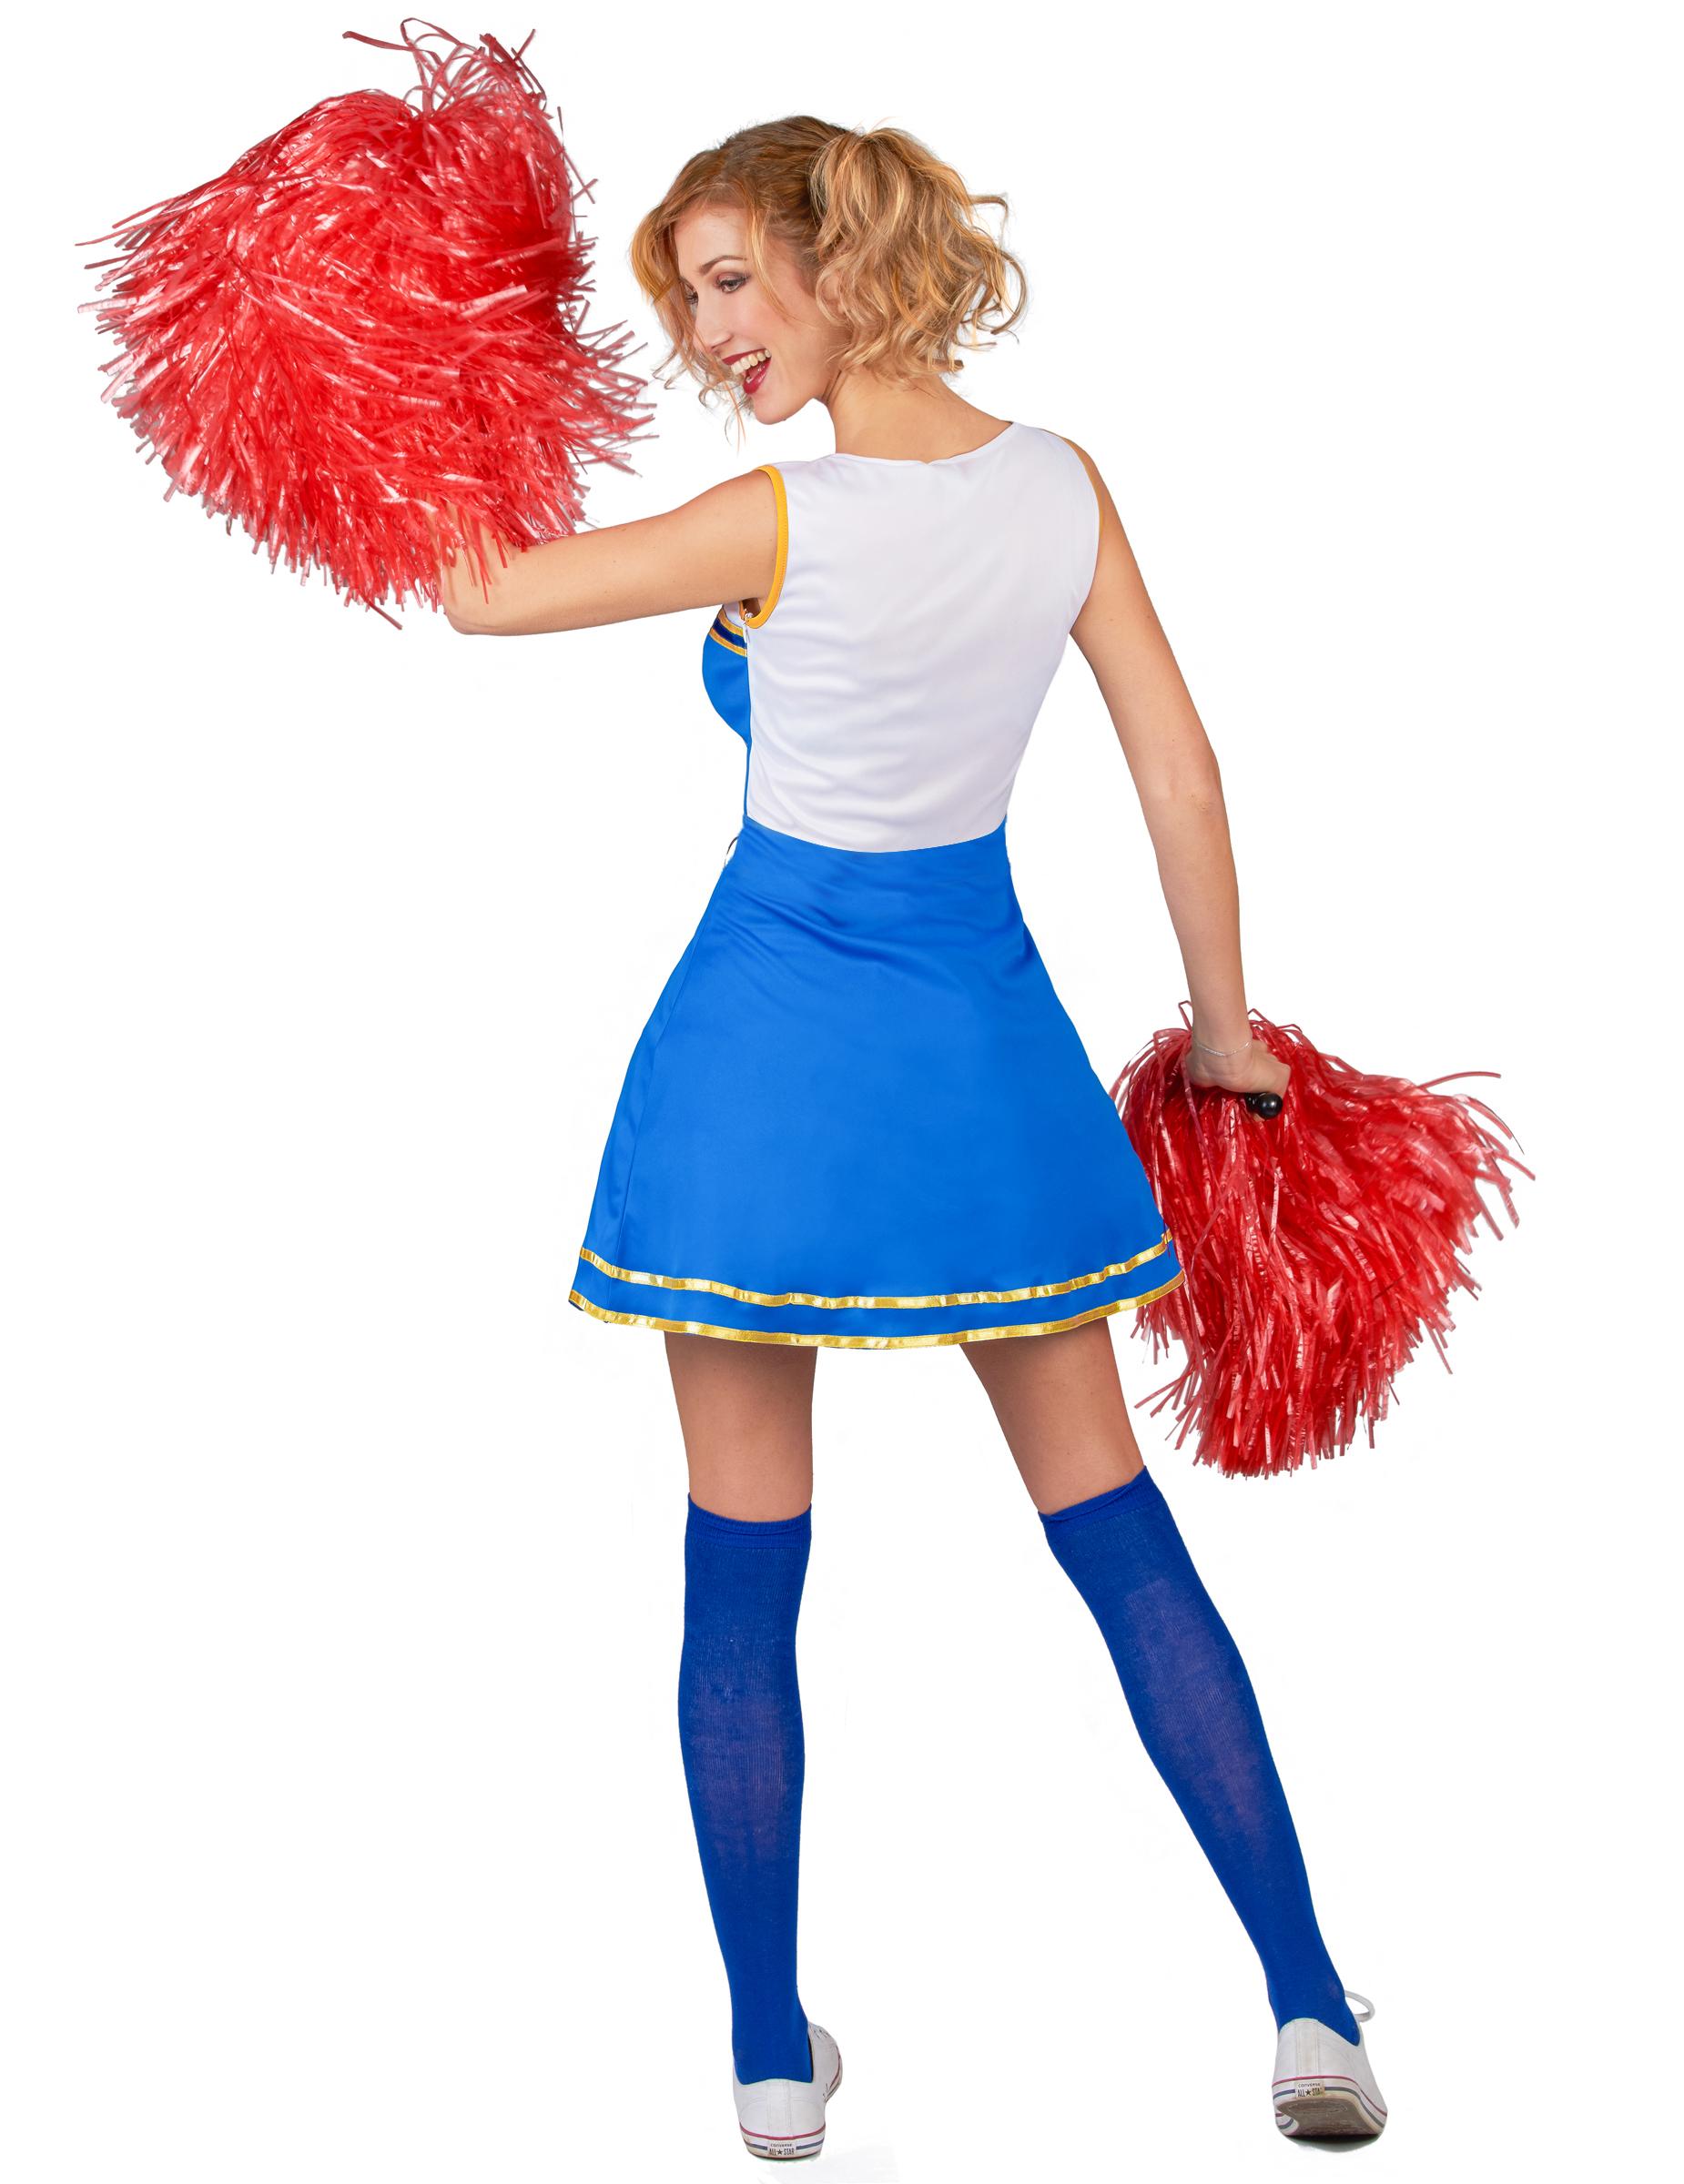 Cheerleaderkostum Fur Erwachsene